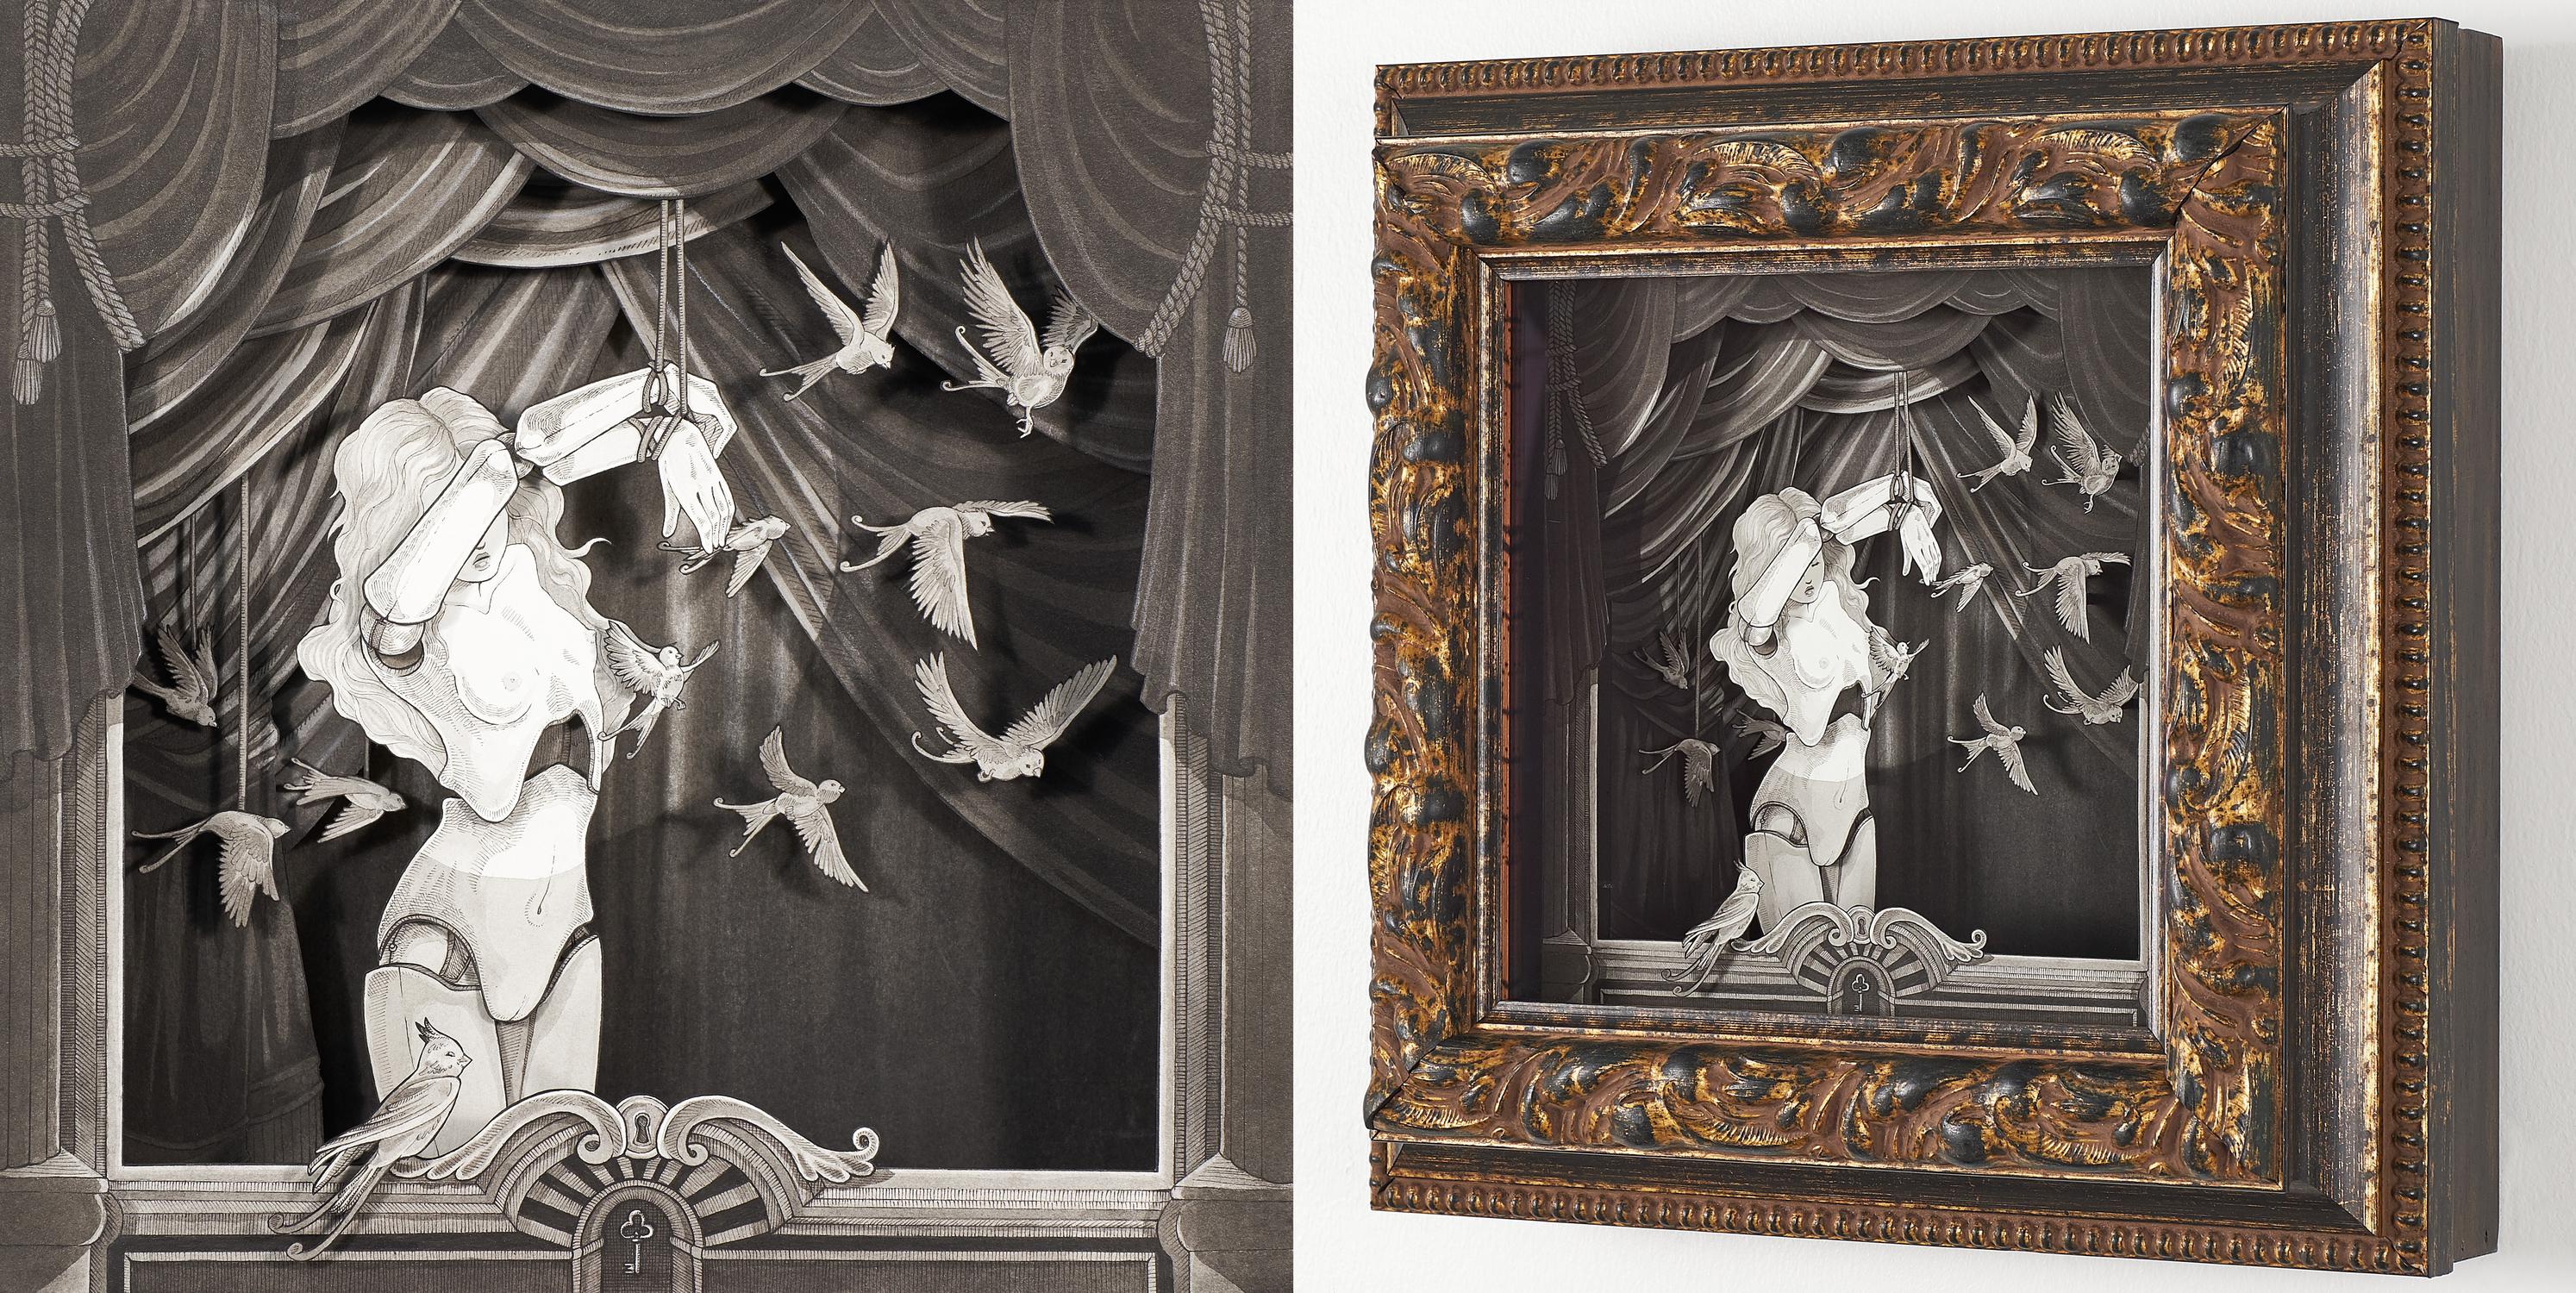 Balance Artwork by Daria Aksenova